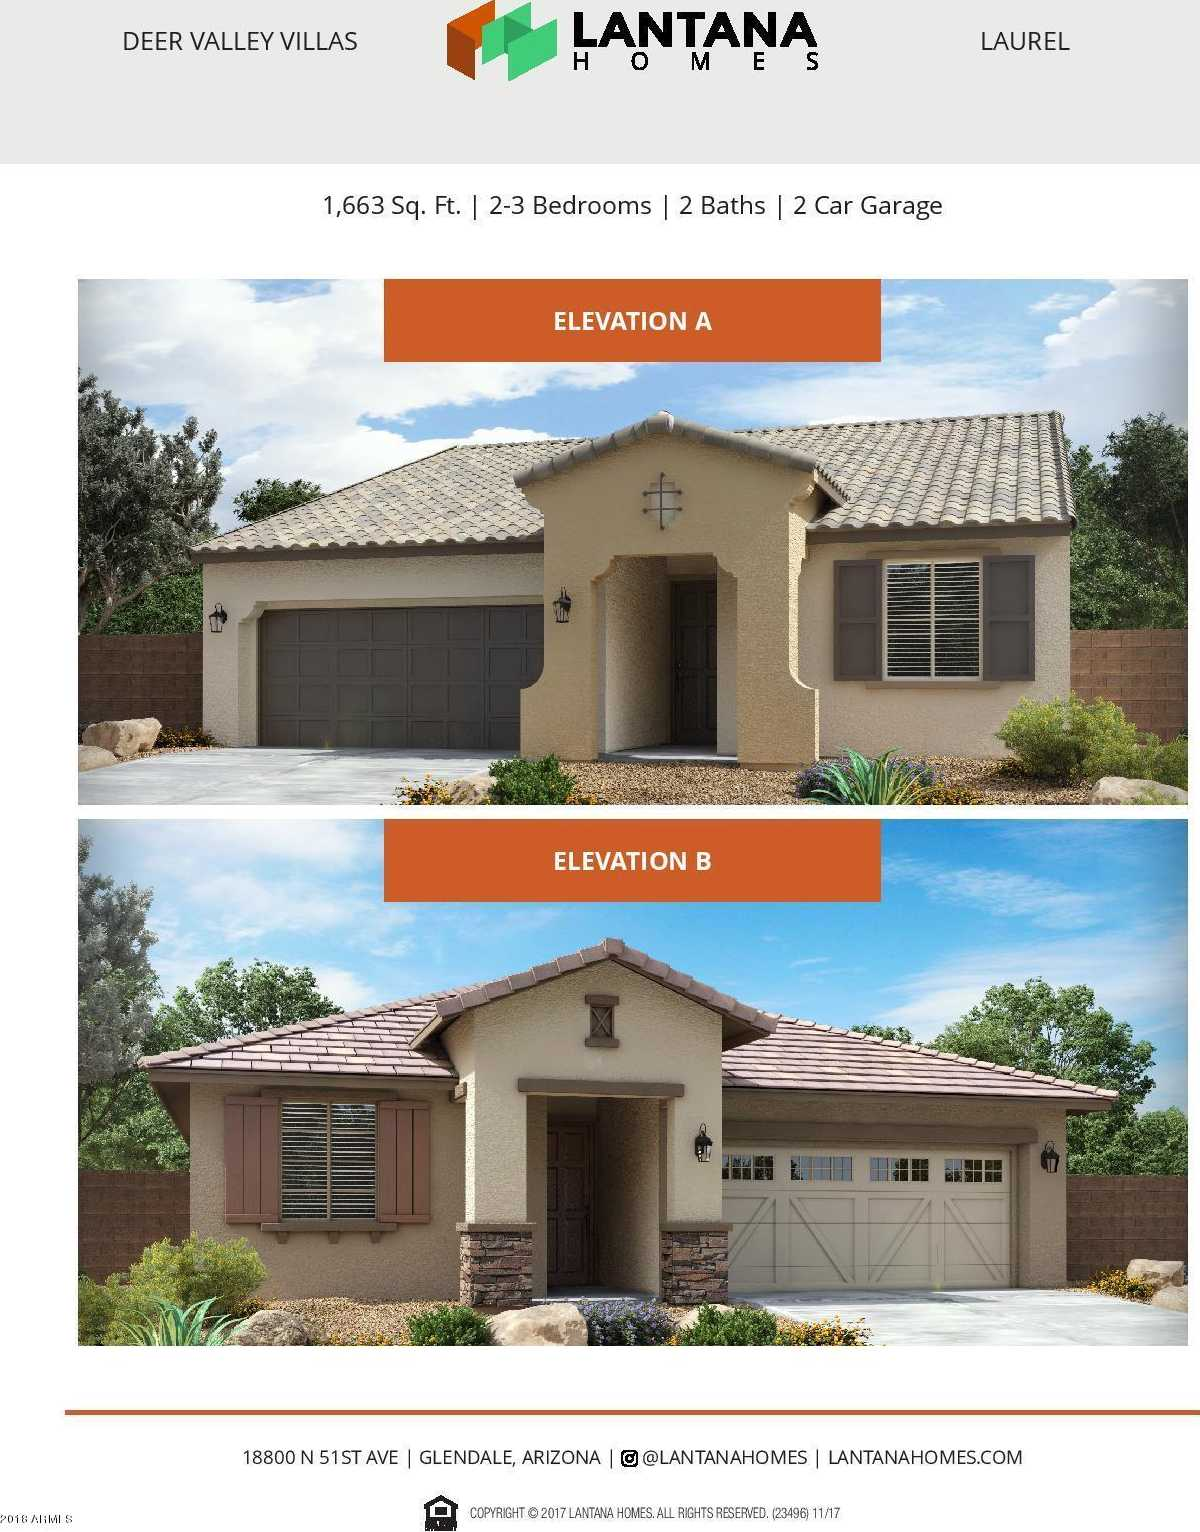 $325,400 - 3Br/2Ba - Home for Sale in Deer Valley Villas, Glendale